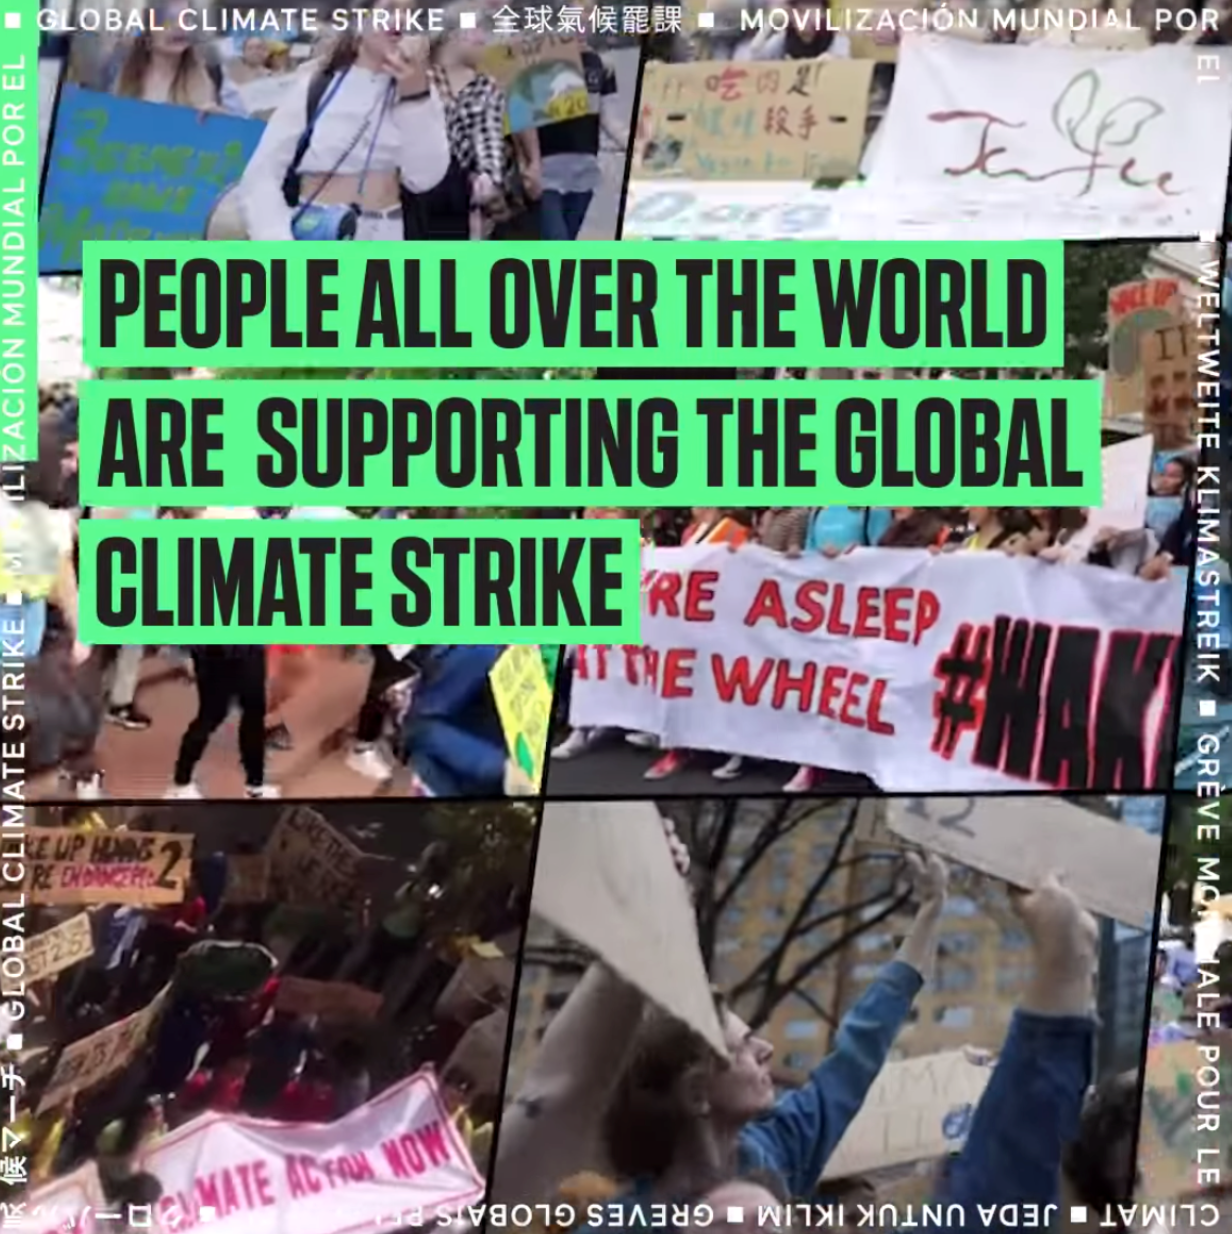 Photo: Global Climate Strike